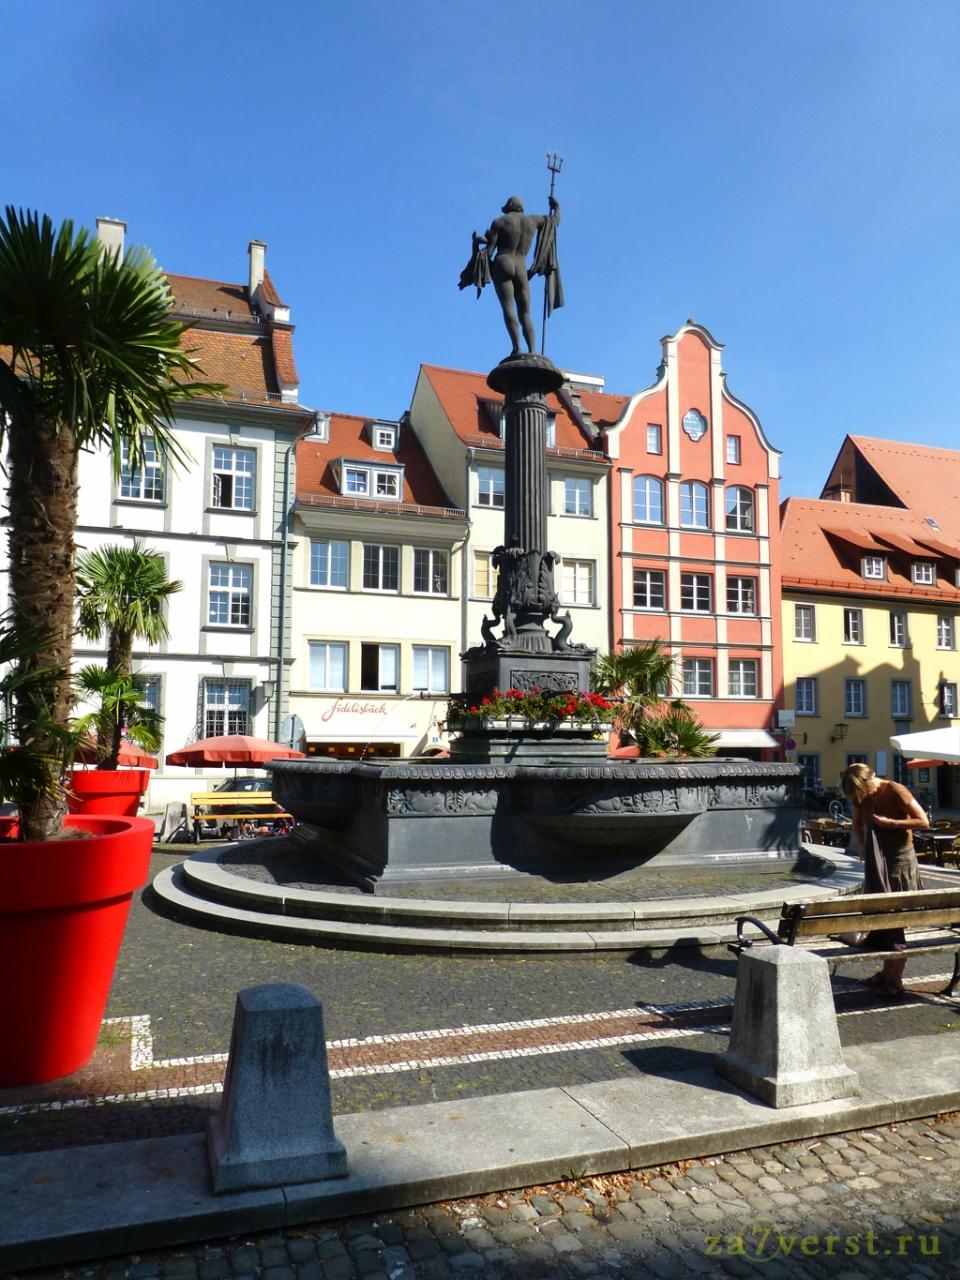 Линдау, Германия